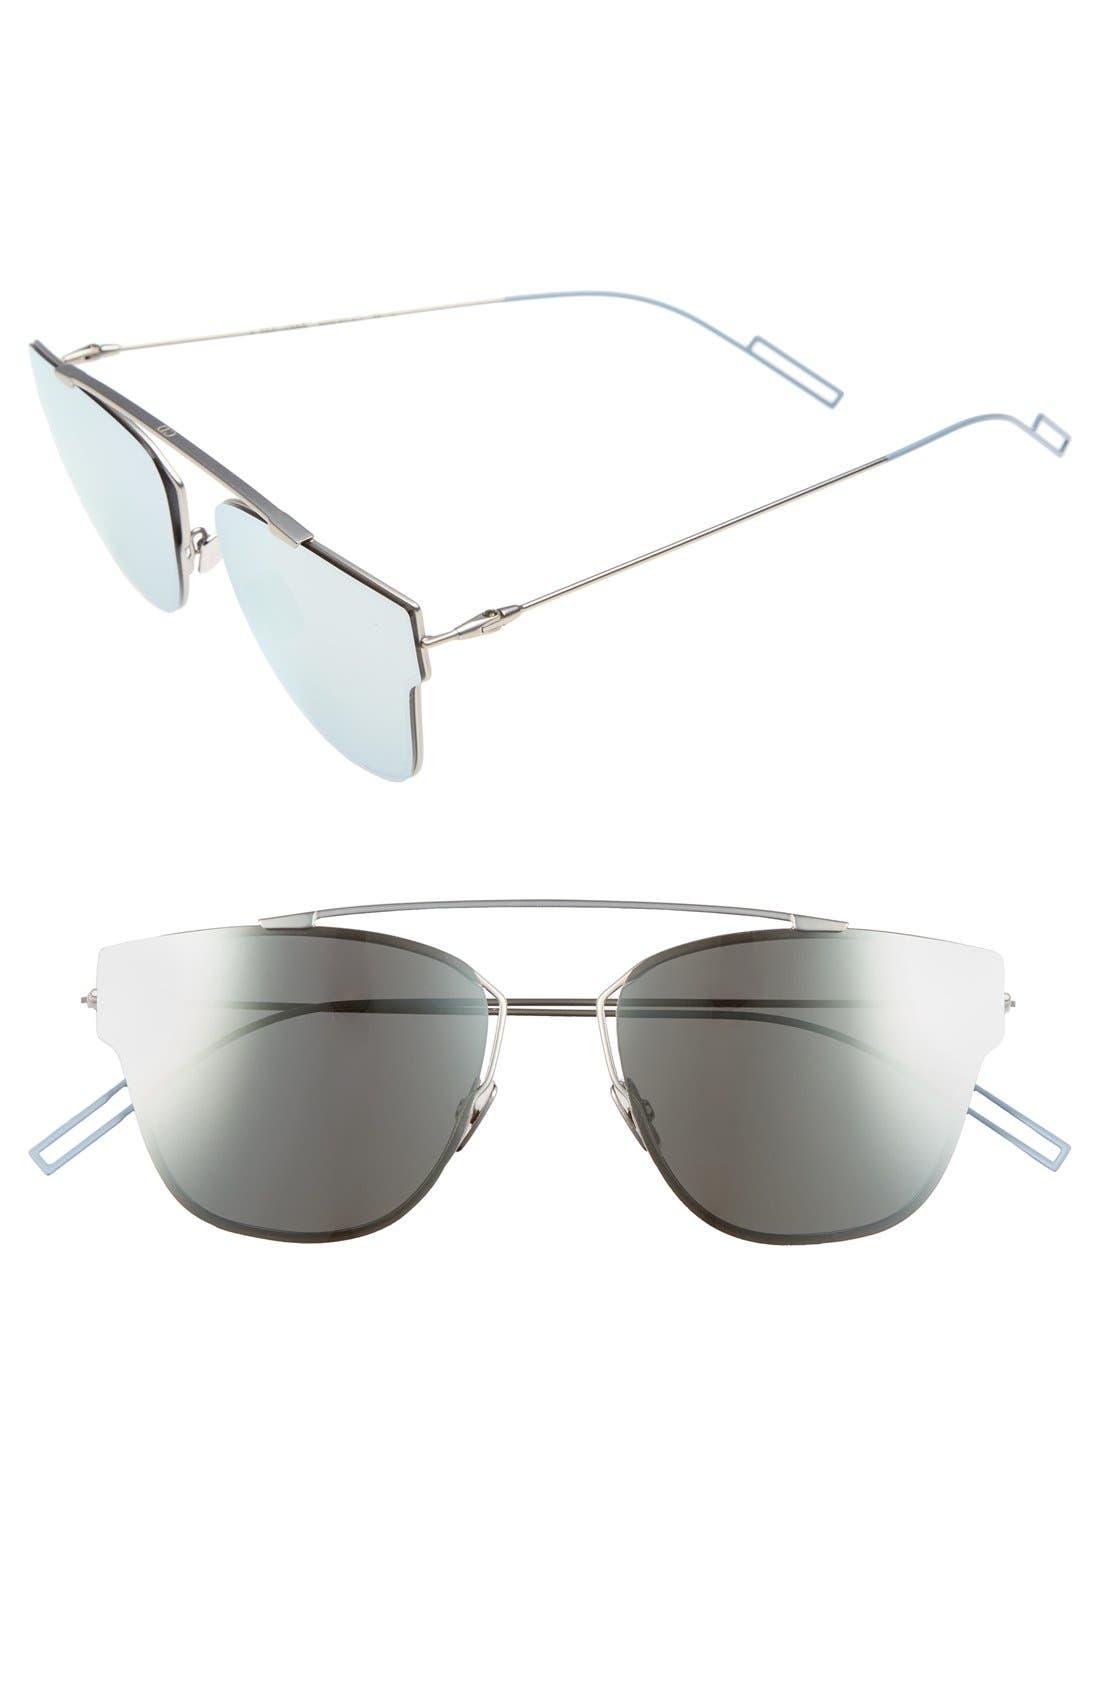 57mm Semi Rimless Sunglasses,                             Main thumbnail 1, color,                             020